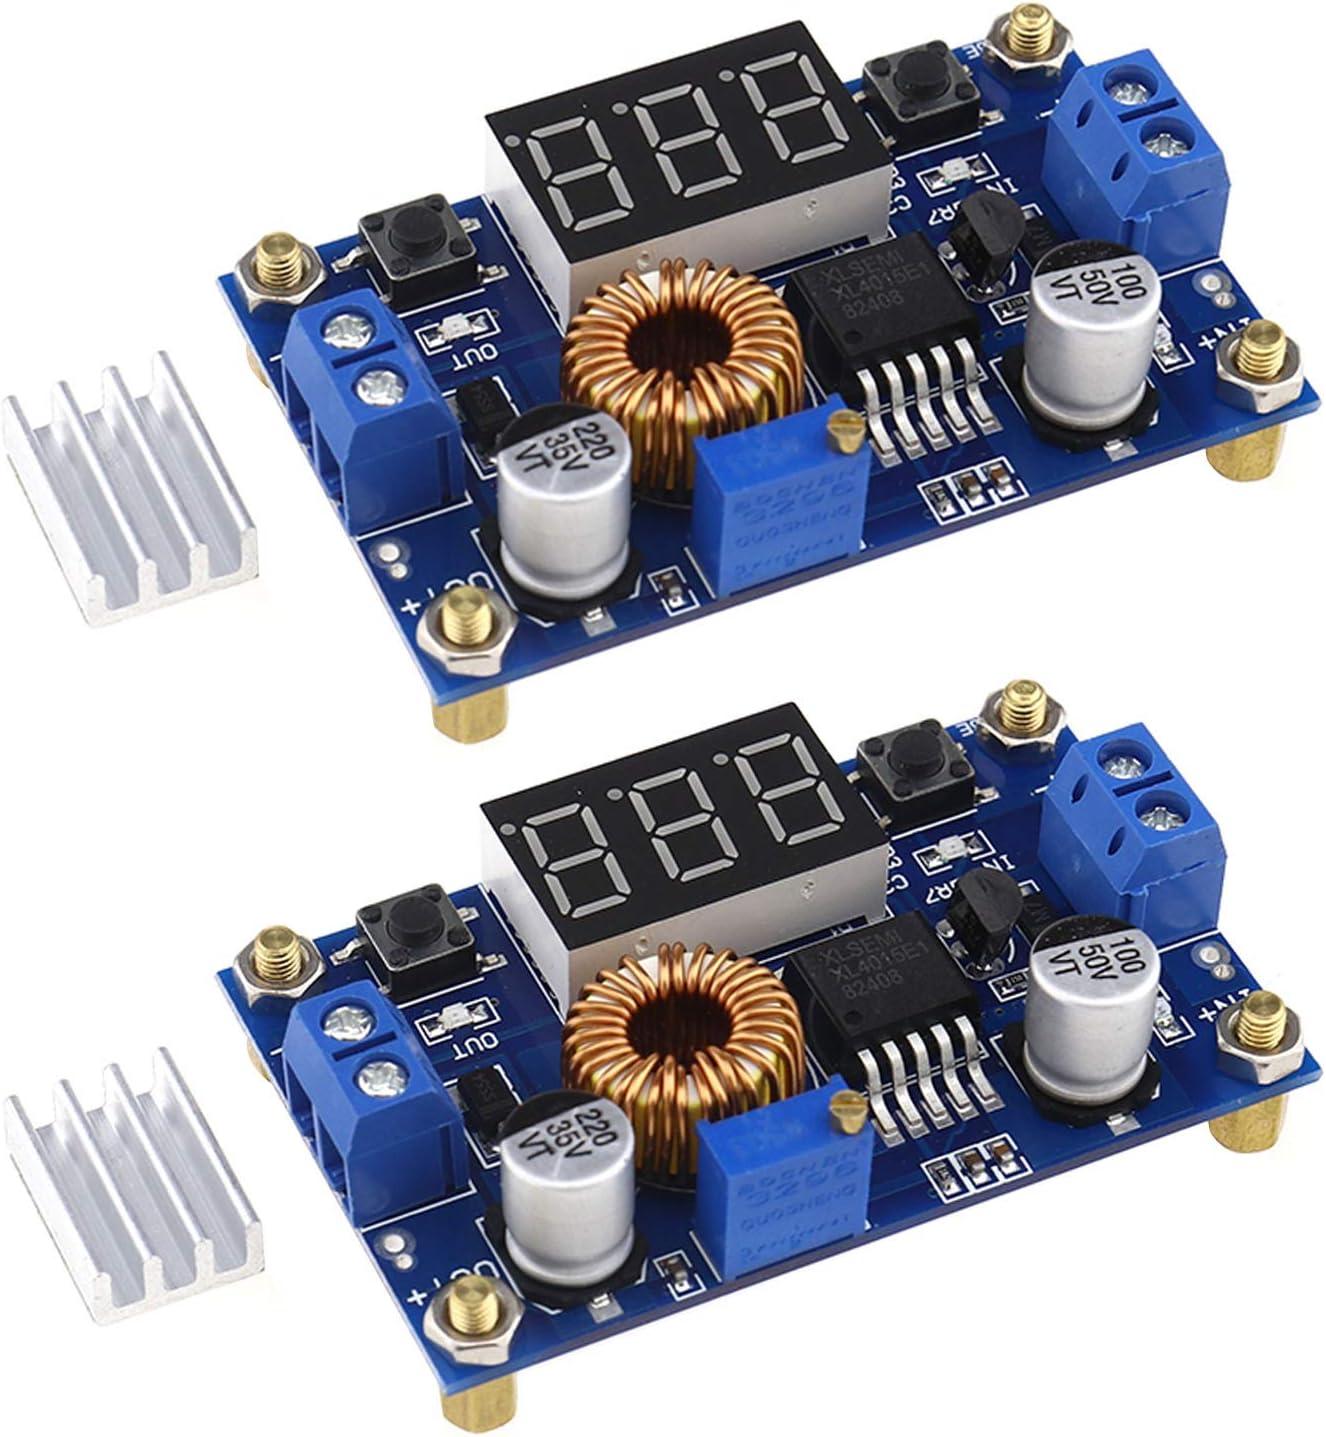 2x XL4015 5A 75W DC-DC Spannungs-Abw/ärtswandler einstellbar LED Voltmeter